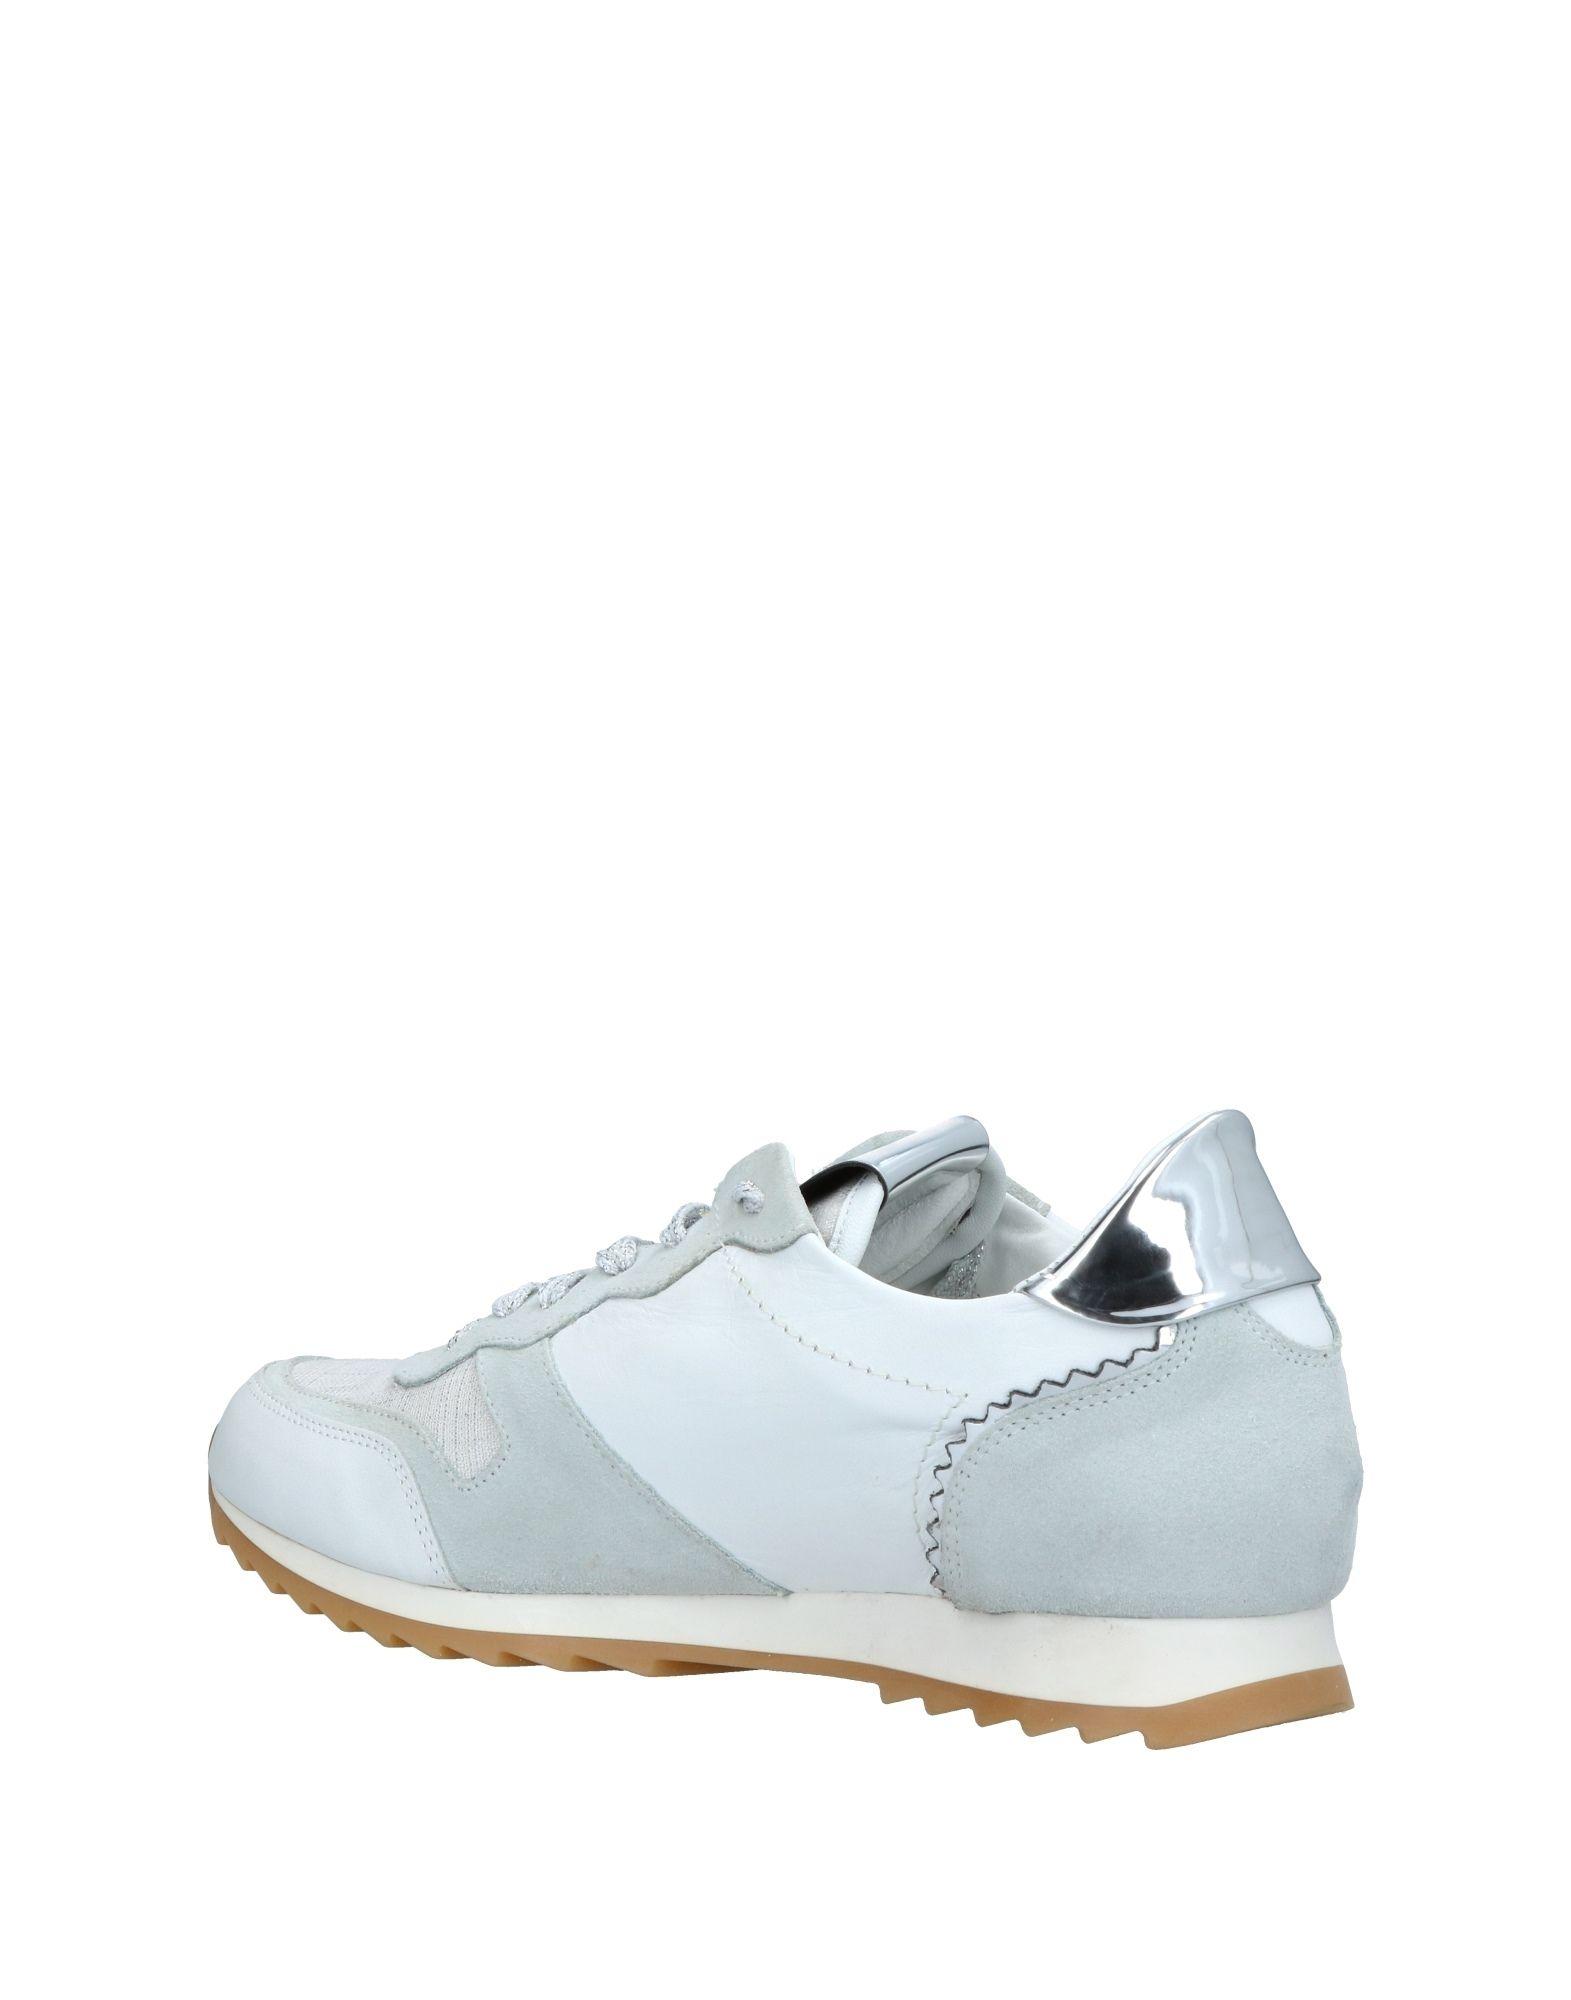 CHAUSSURES - Chaussures à lacetsPunto Pigro bGycOZ